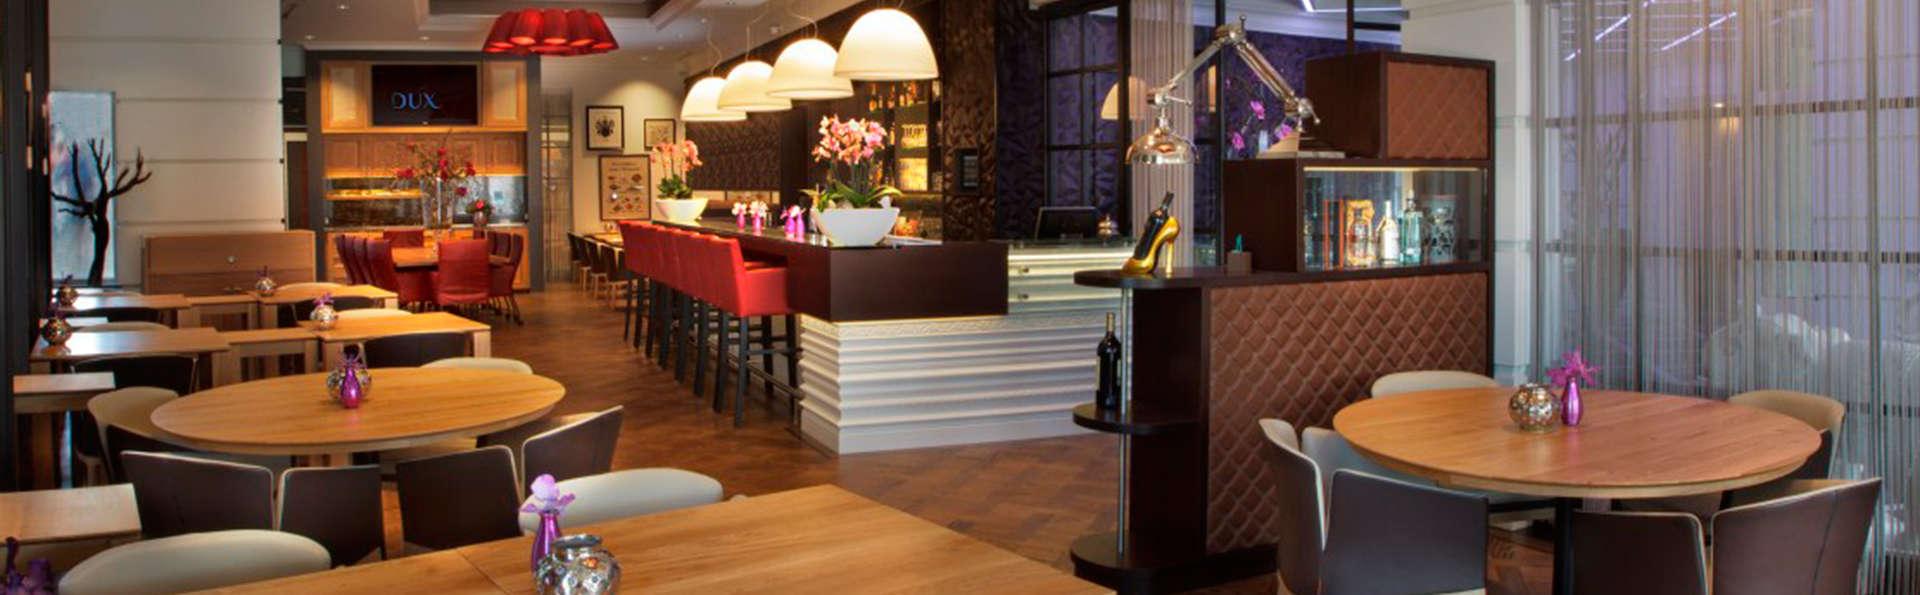 Hotel Dux - EDIT_bar.jpg